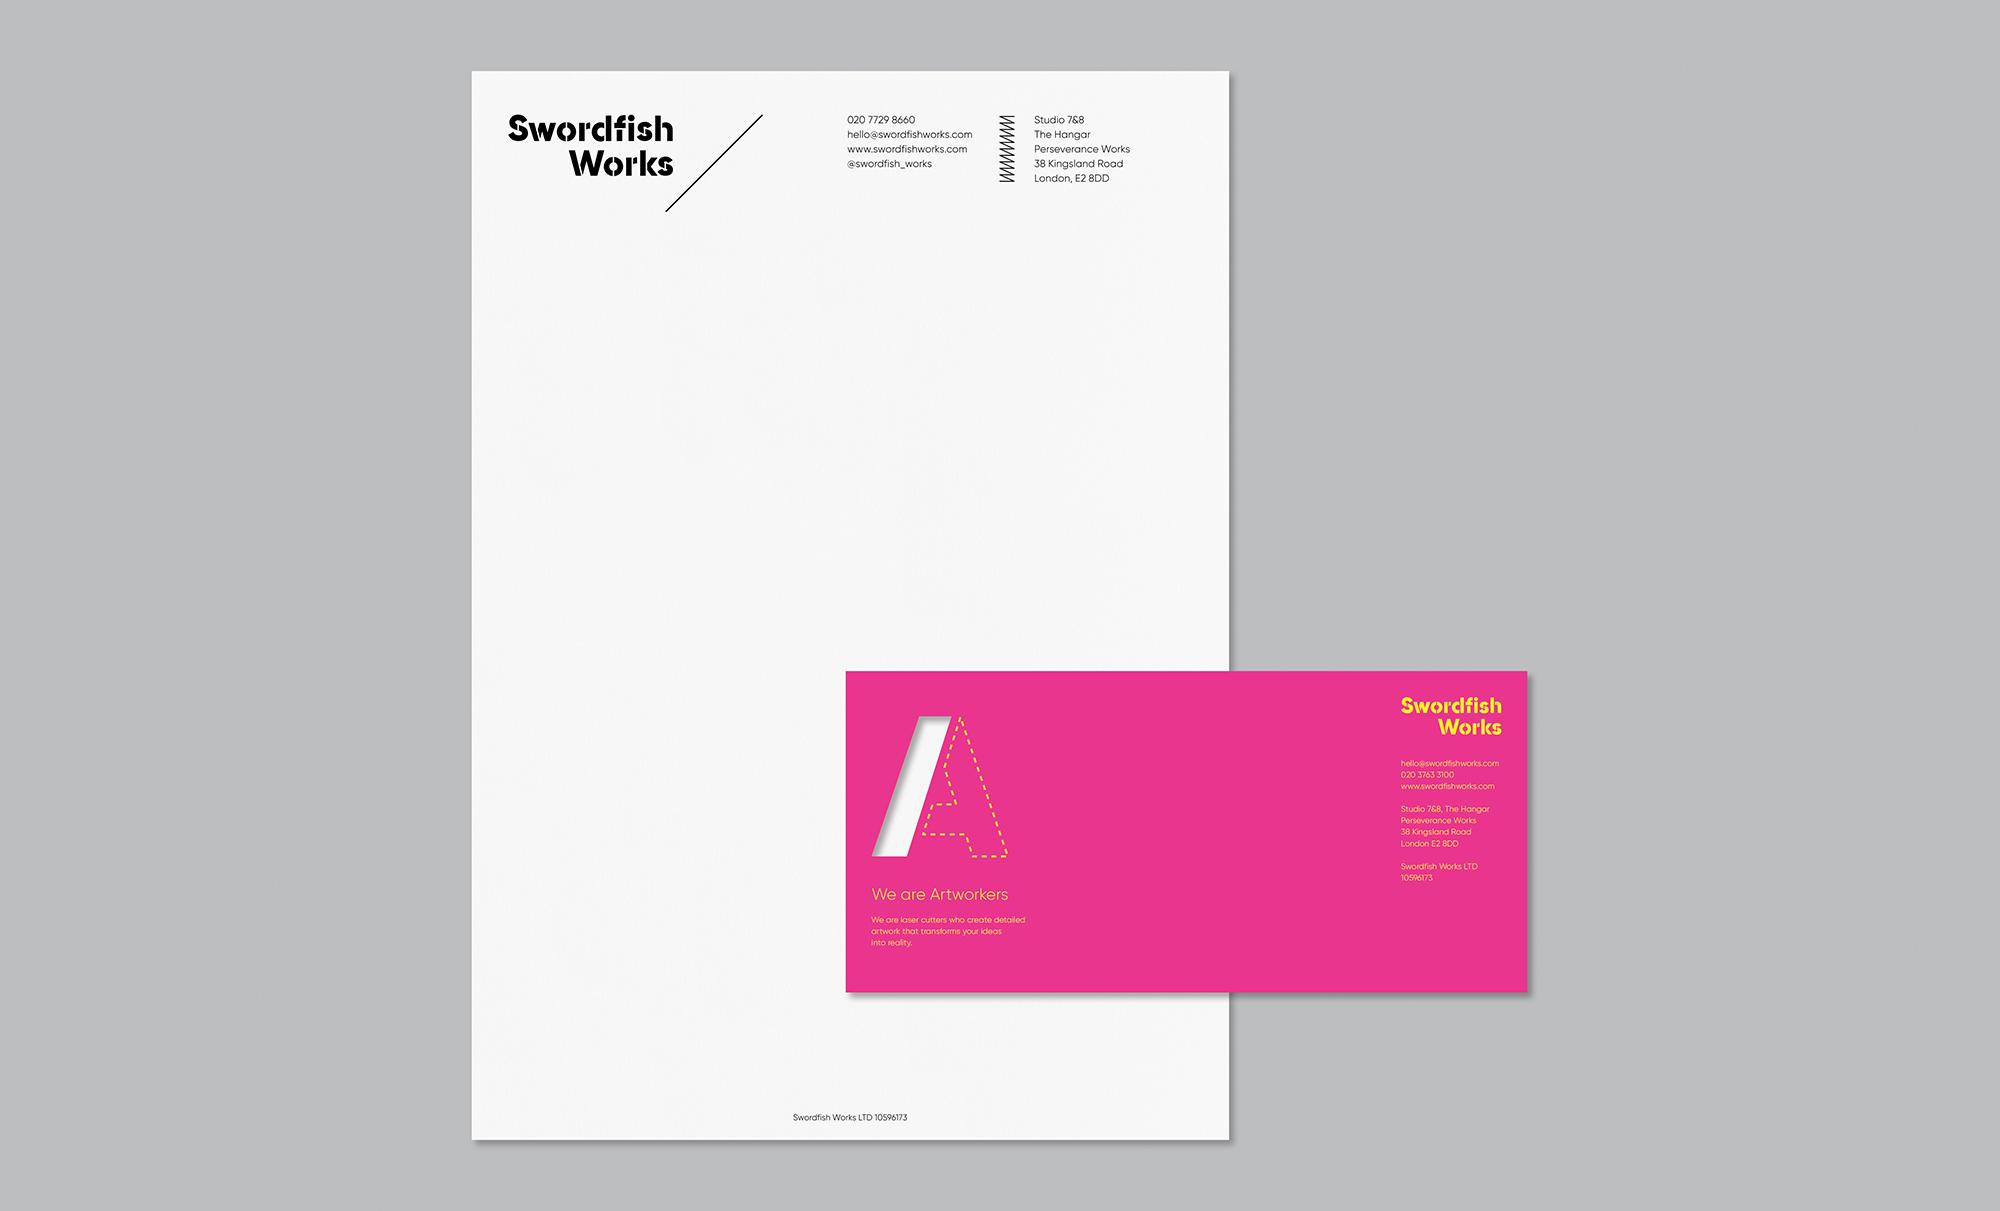 Cover image: Swordfish Works